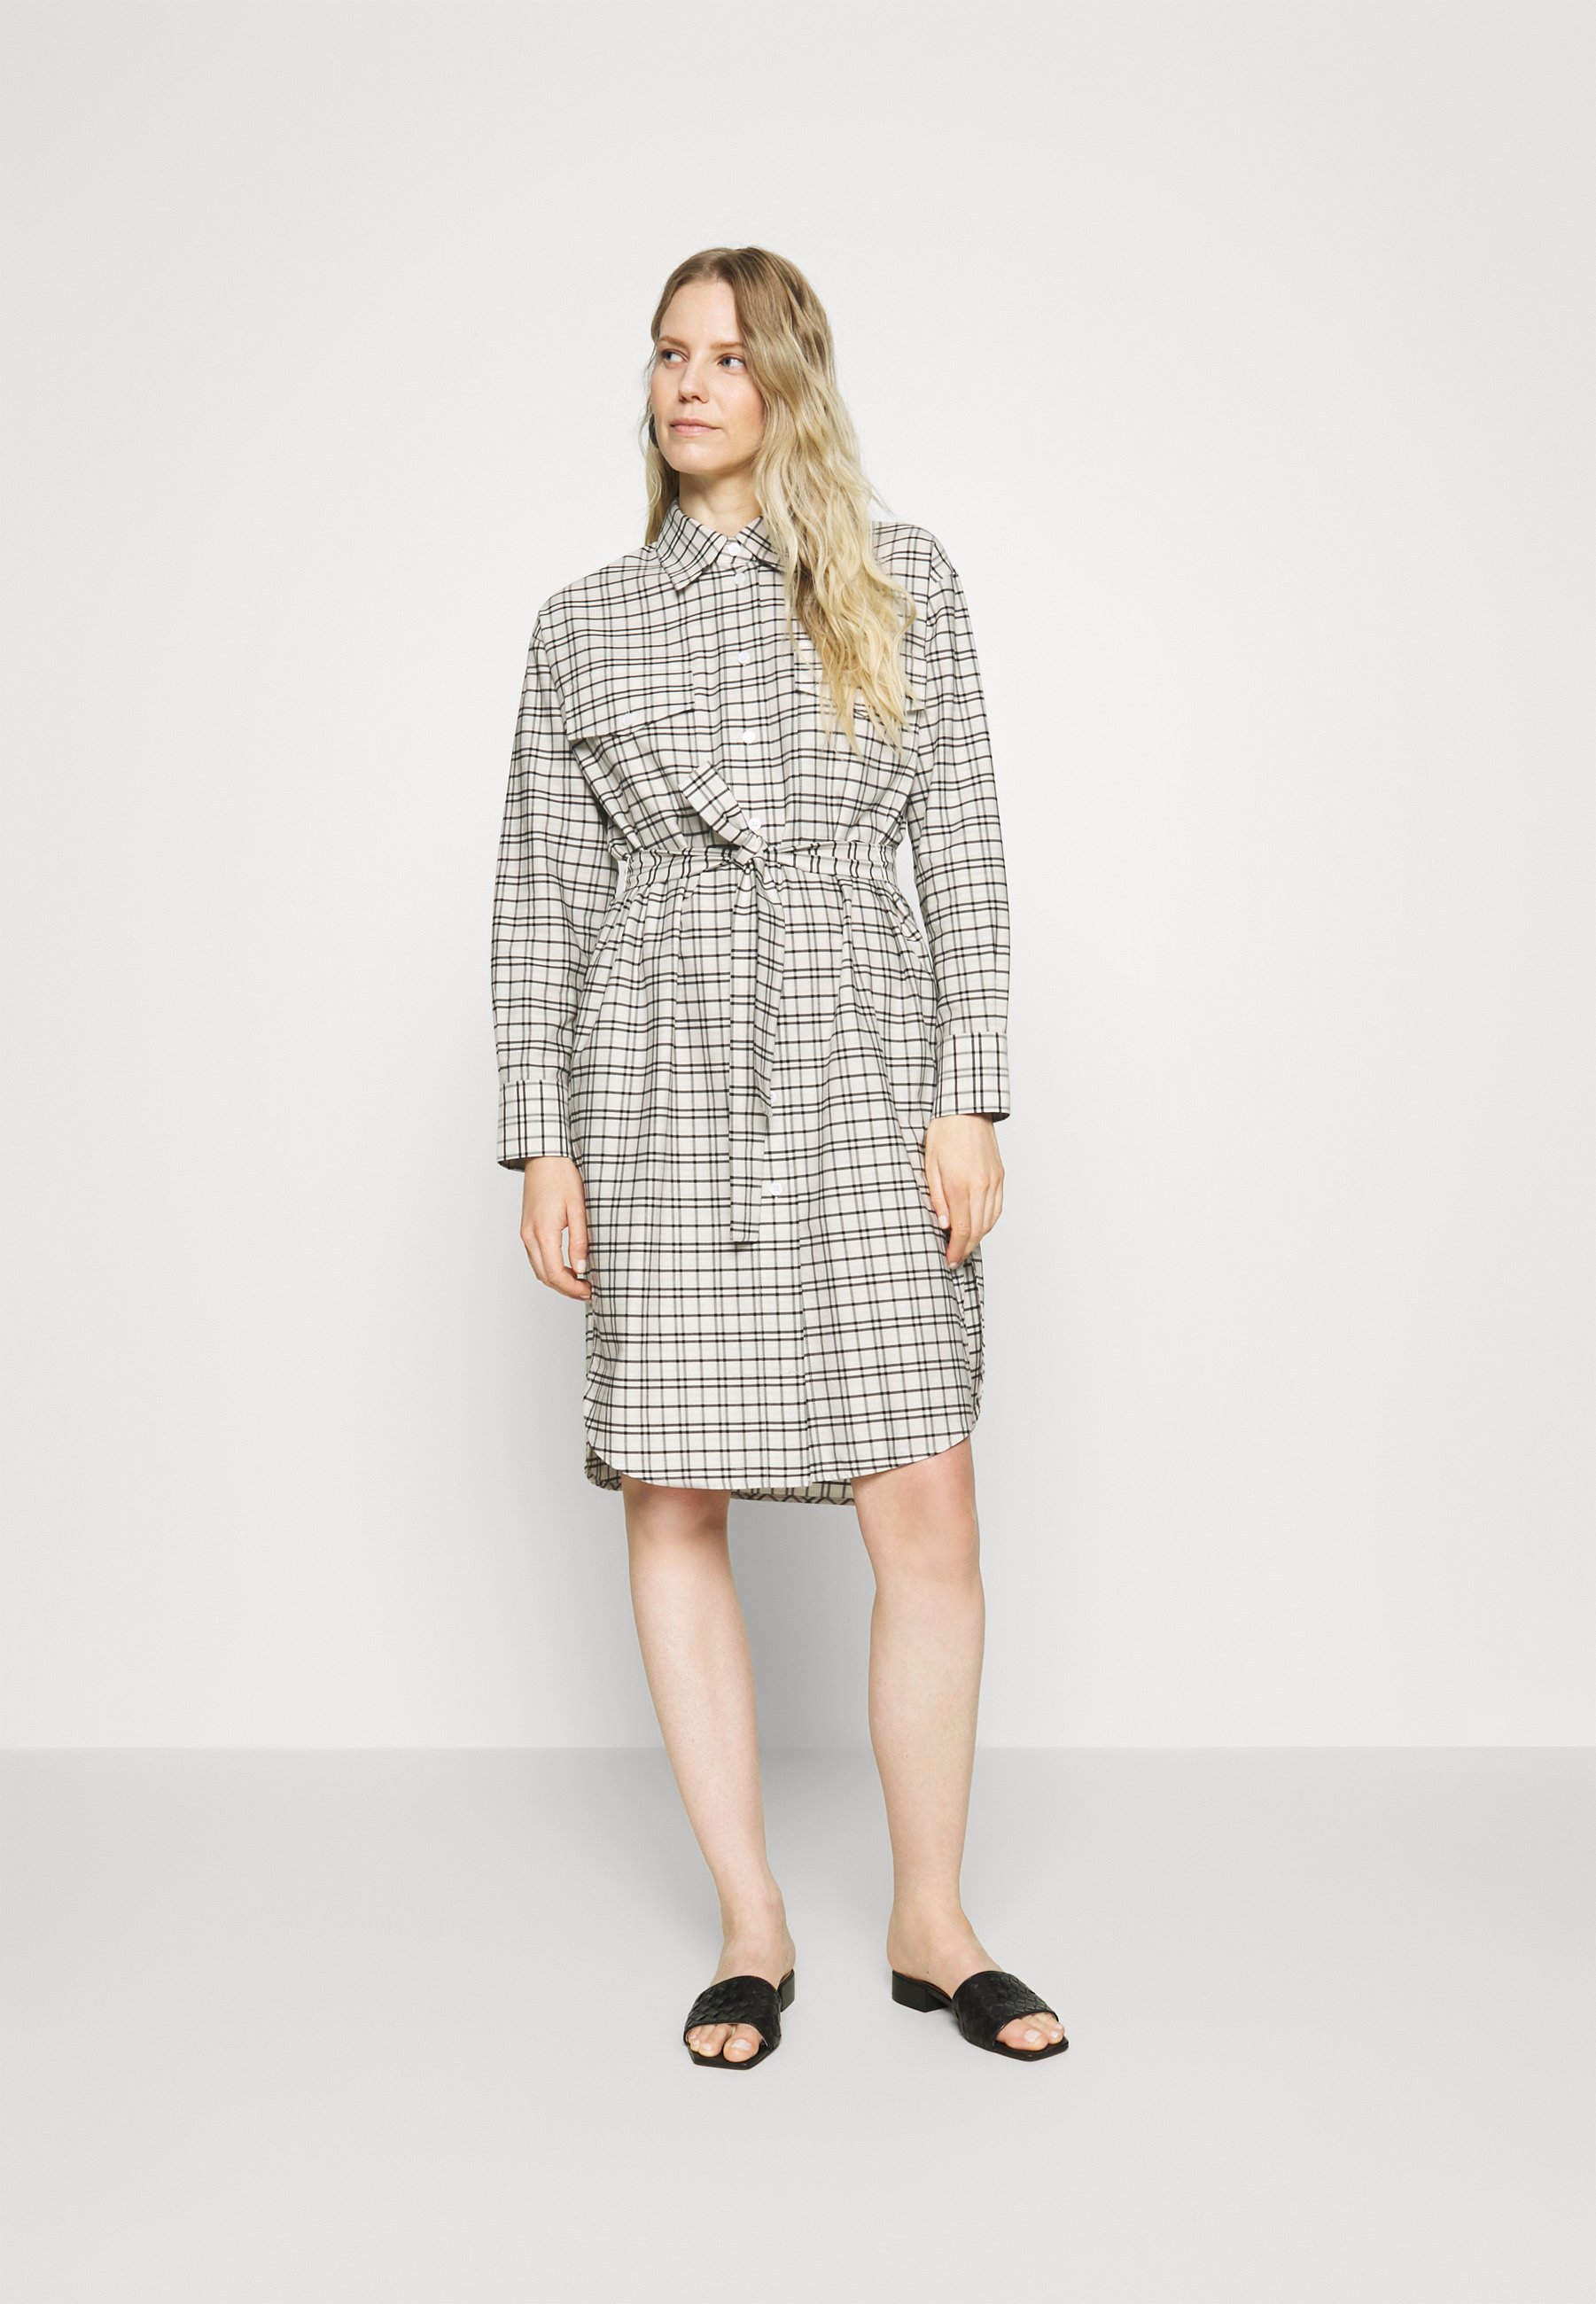 Original Women's Clothing Seidensticker LANGARM Shirt dress offwhite xQXMv76s6